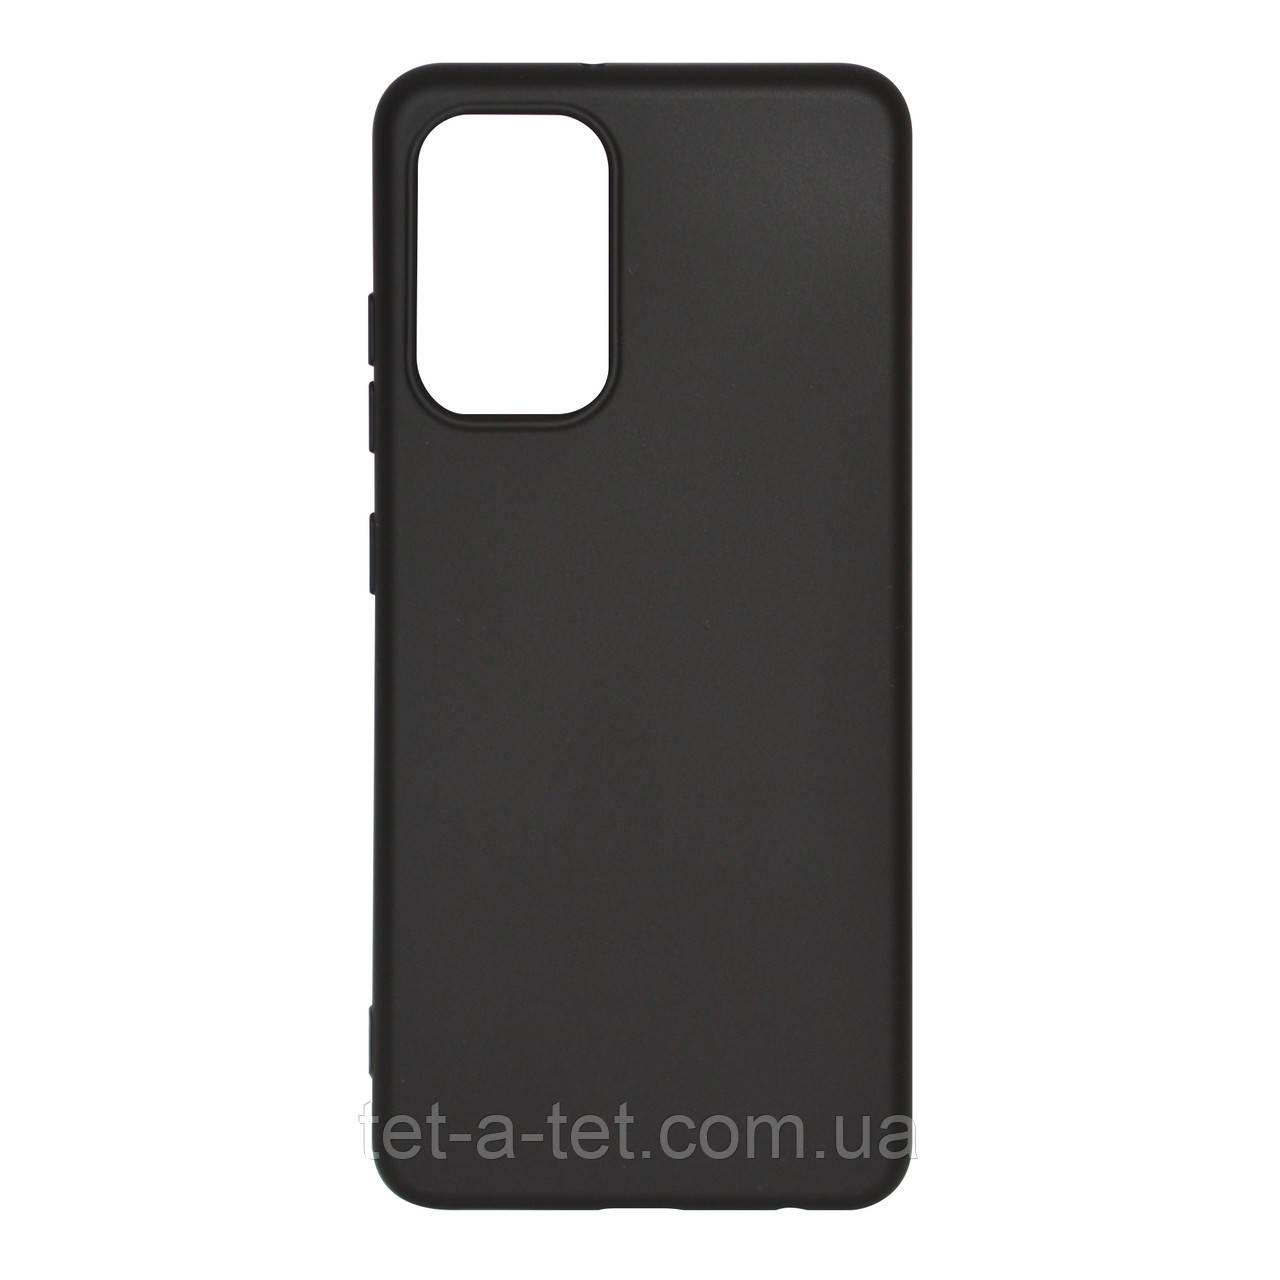 Чохол силіконовий ArmorStandart ICON Case for Samsung A32 (A325) Black